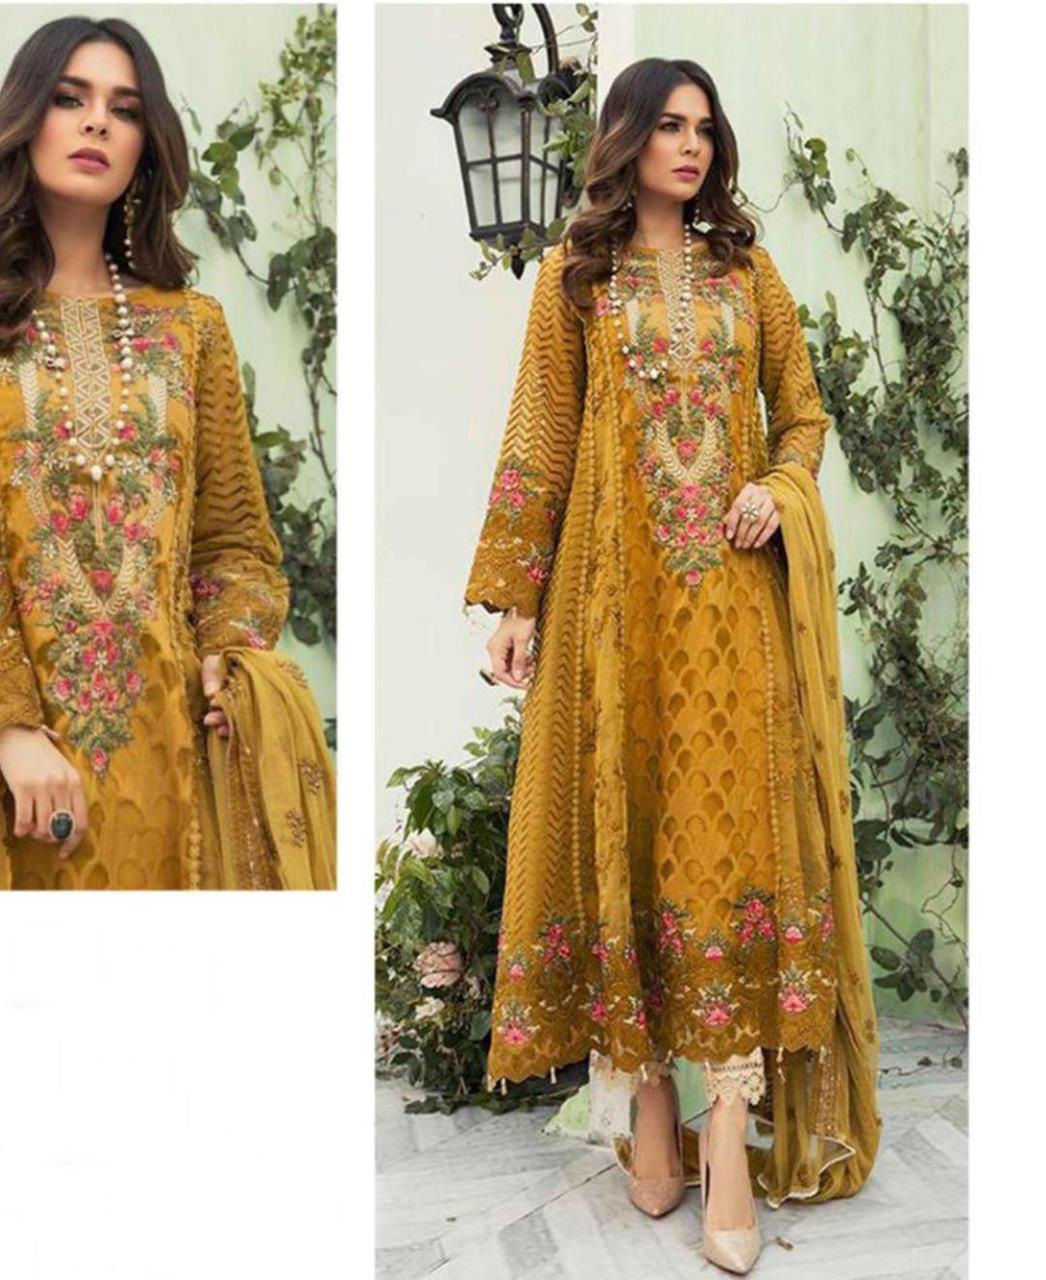 Embroidered Georgette Straight cut Salwar Kameez in Musterd